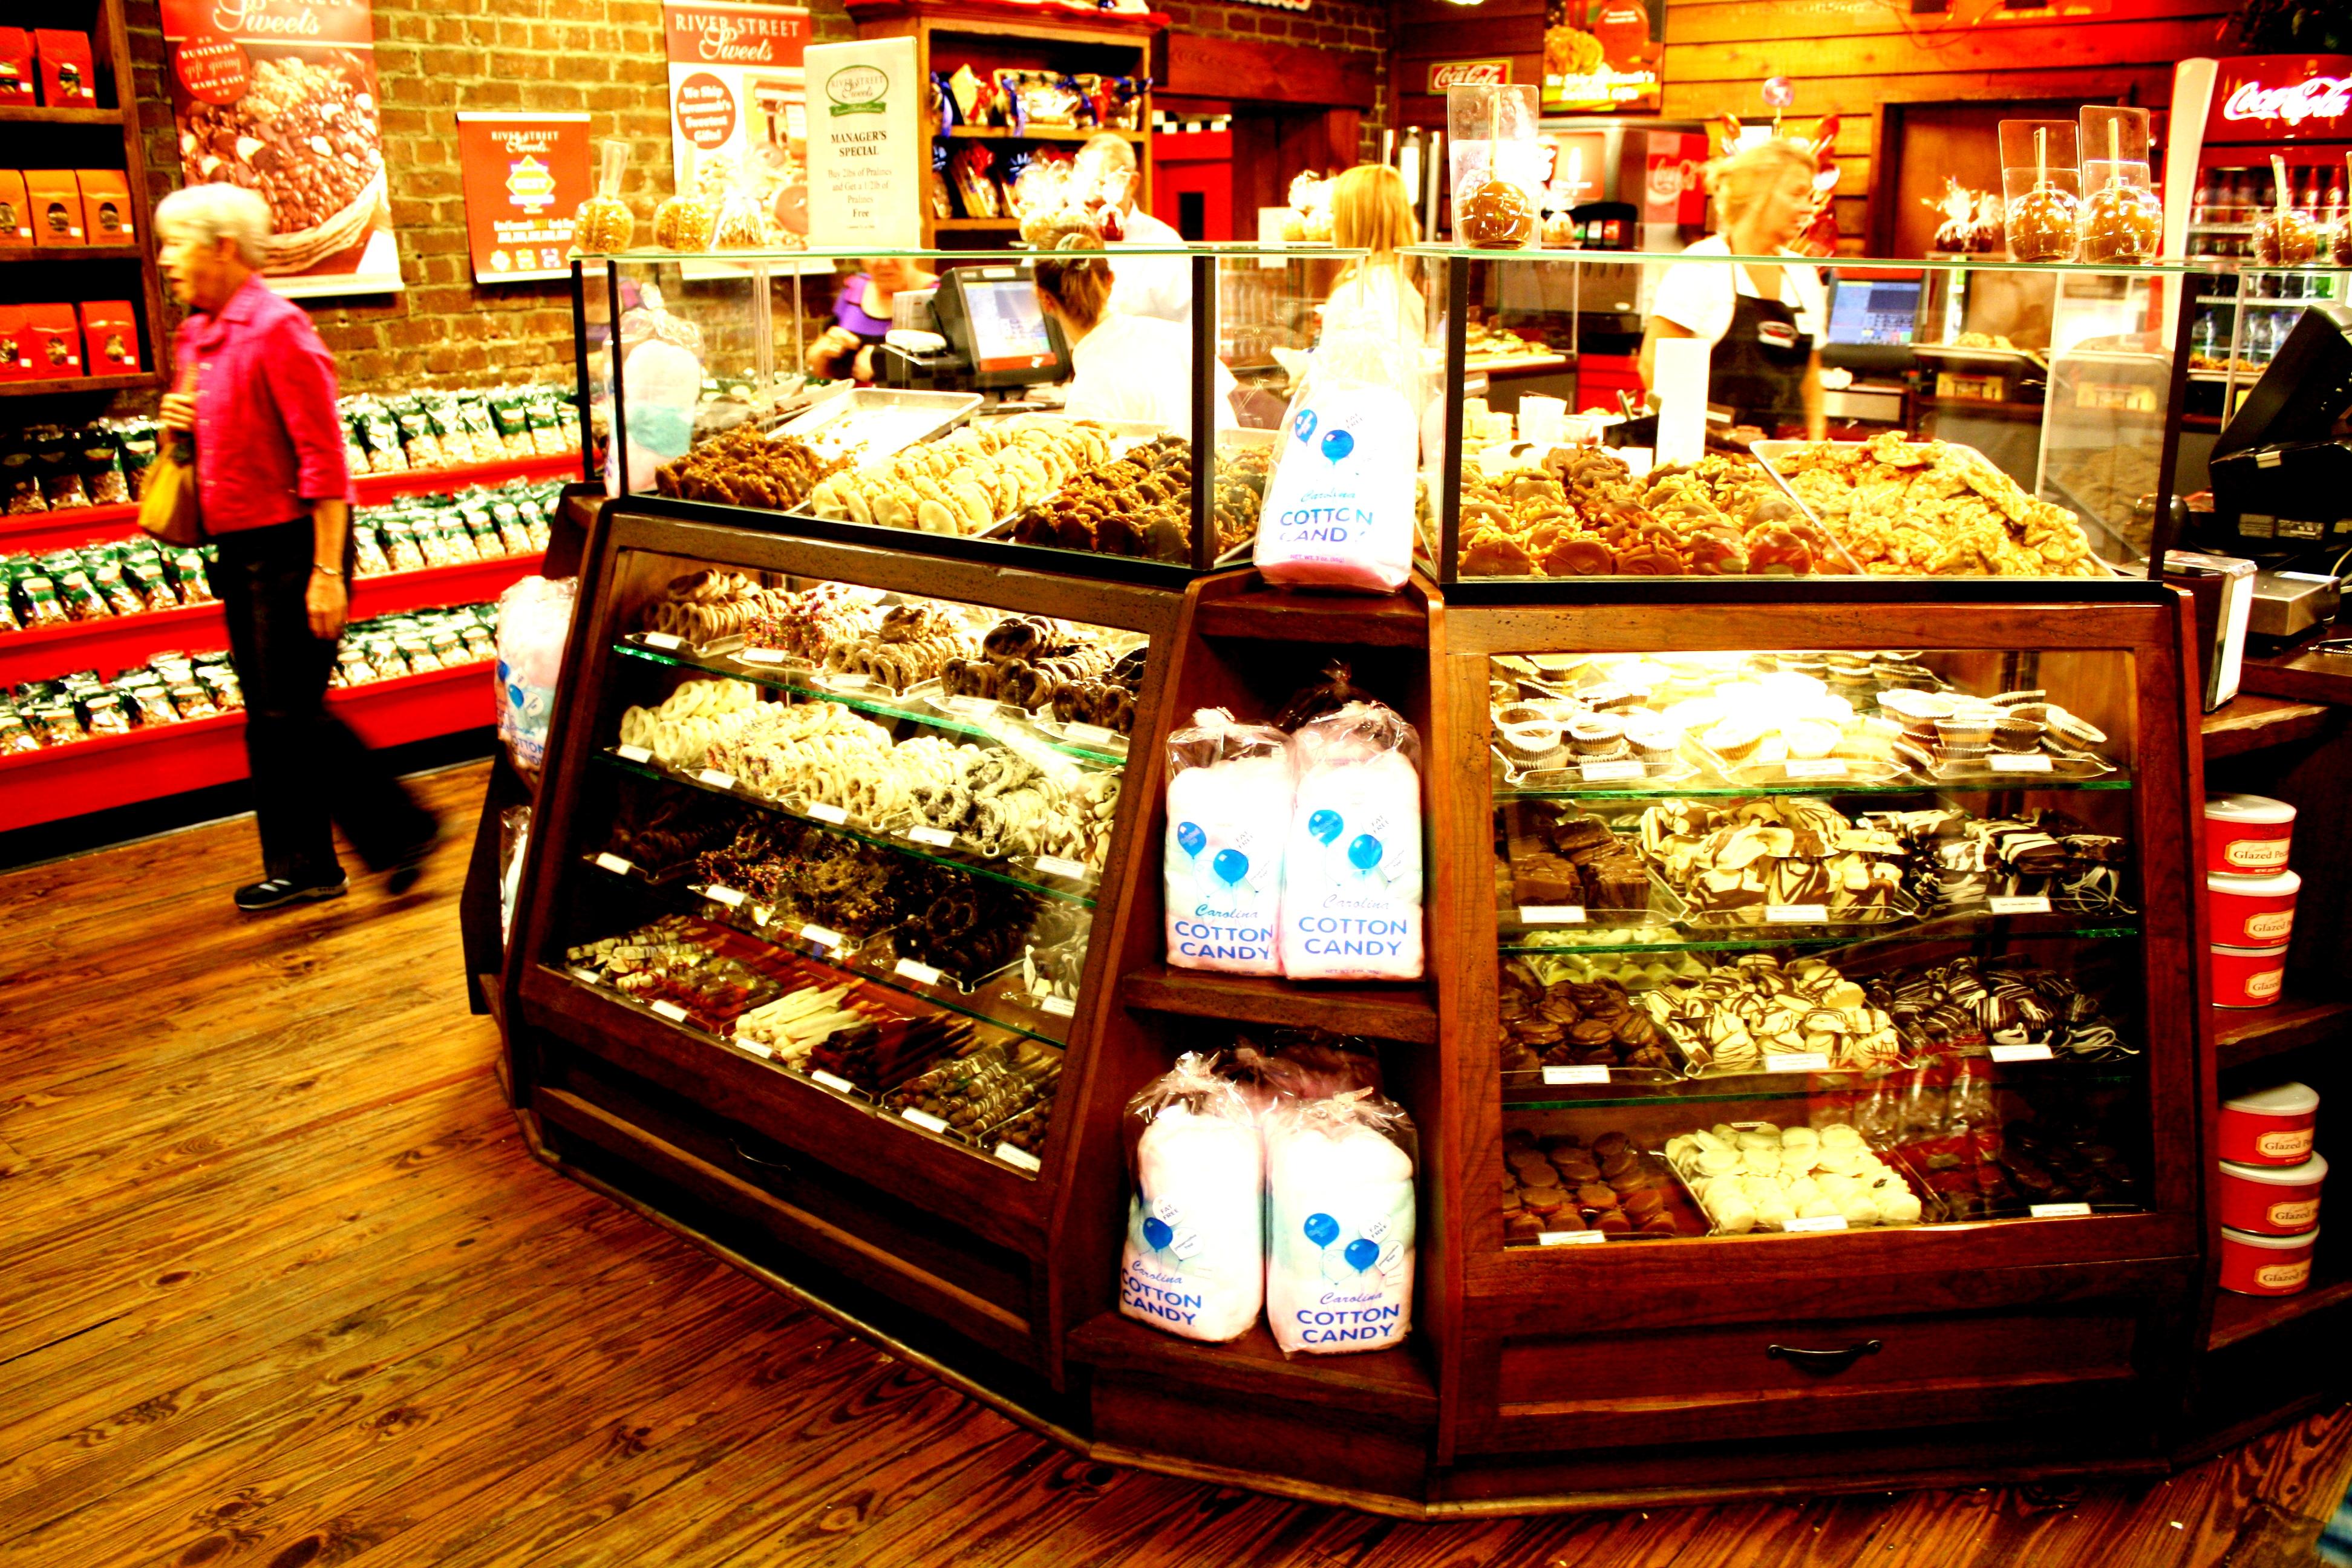 Savannah Candy Kitchen - Savannah, GA Image